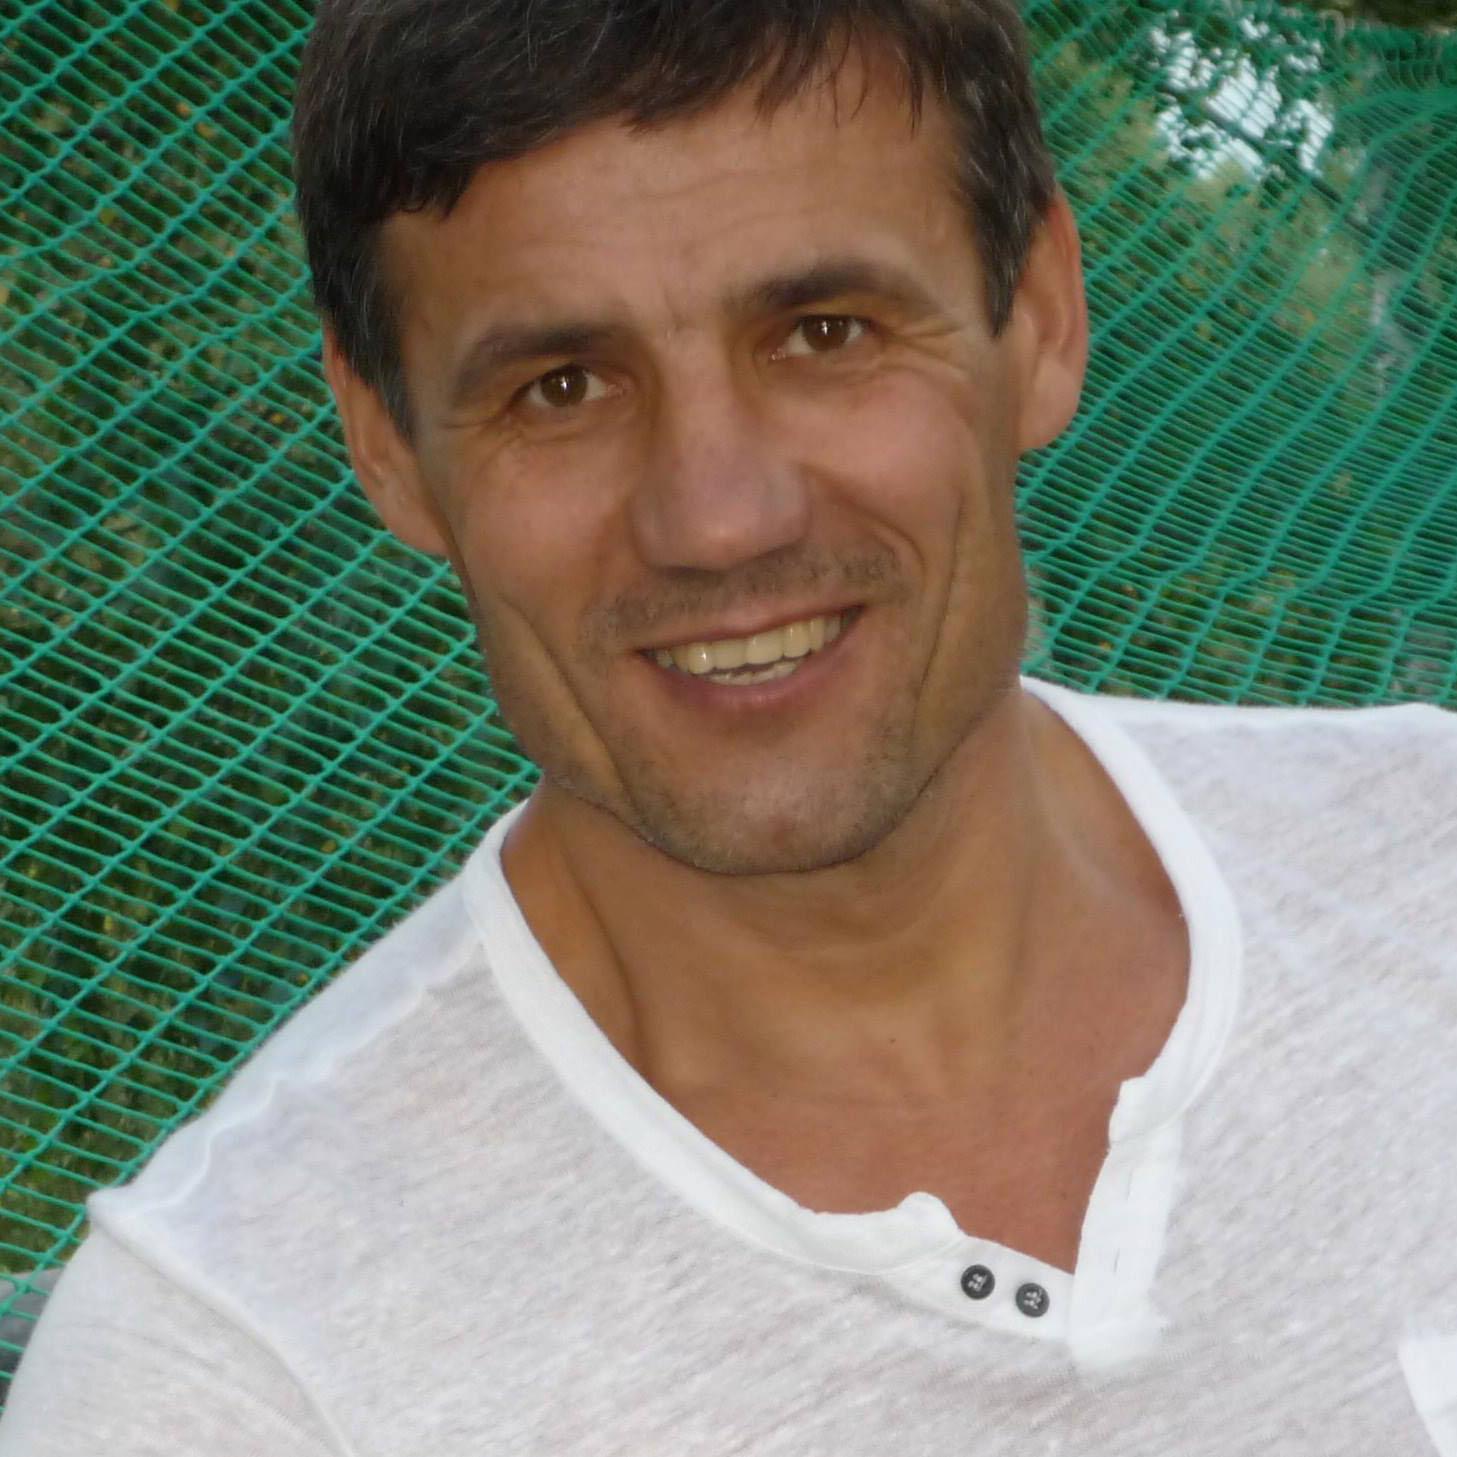 Dr. Olegas Batutis, Lithuania